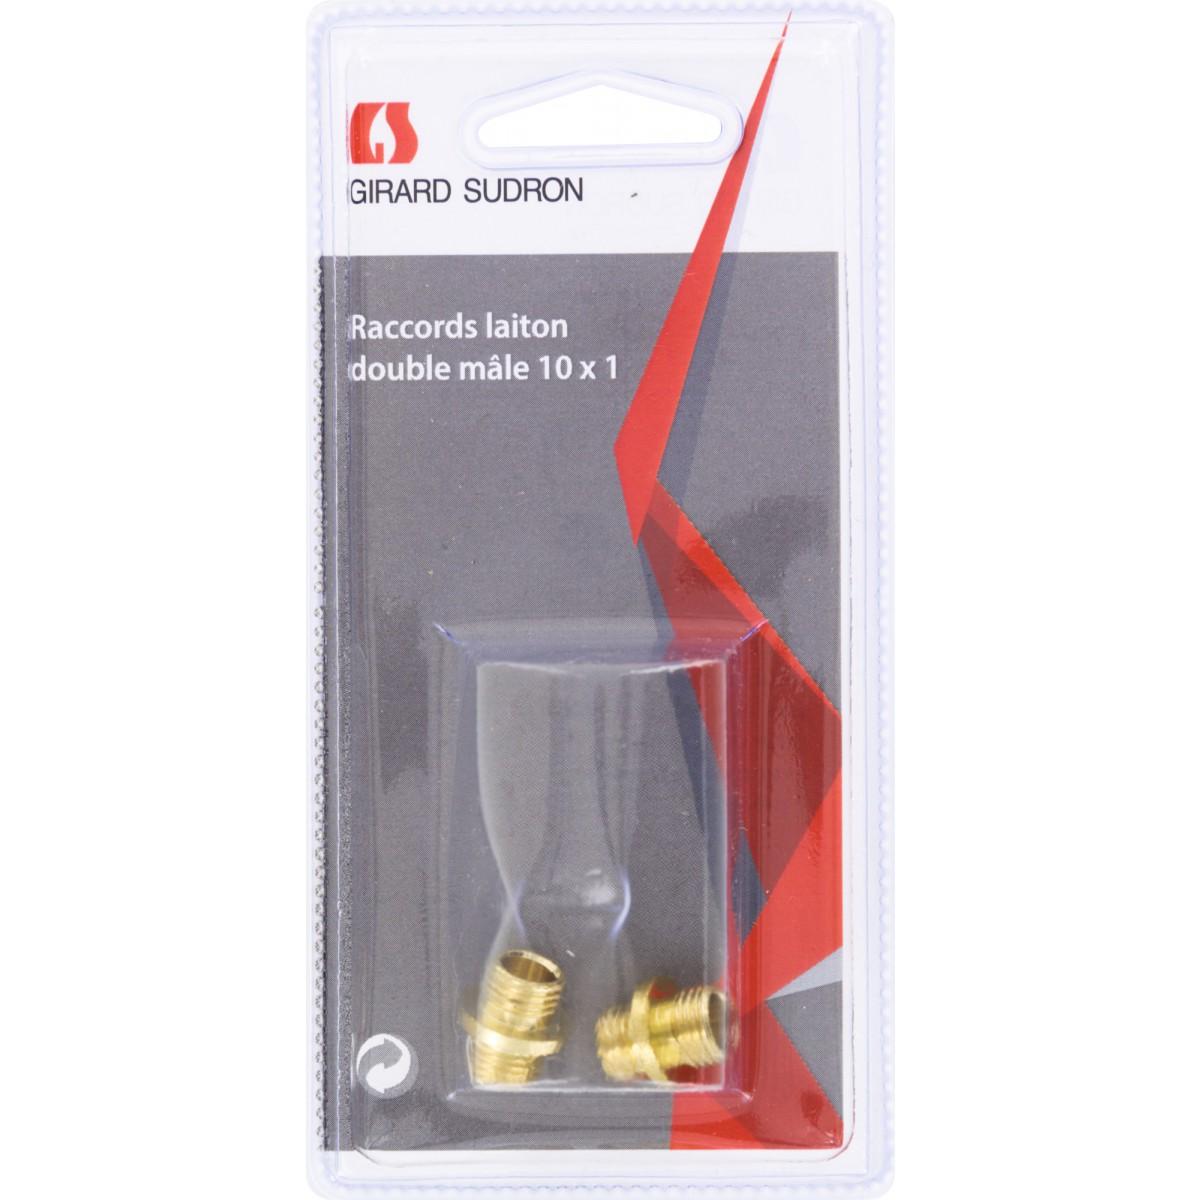 Raccord lustrerie Girard Sudron - 2 mâles 10 x 1 mm - Vendu par 2